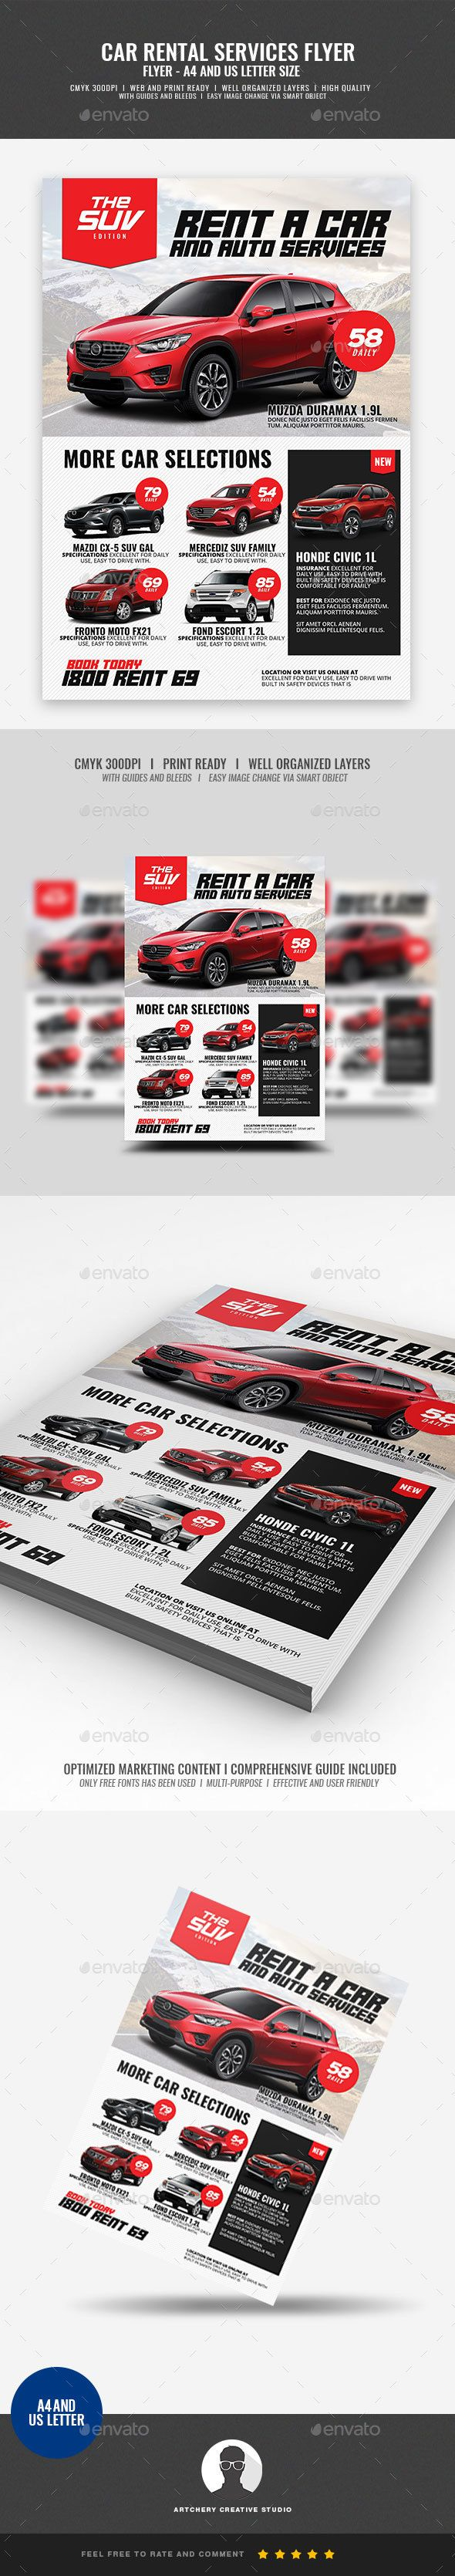 #Car Rental Promotional Flyer - #Corporate #Flyers